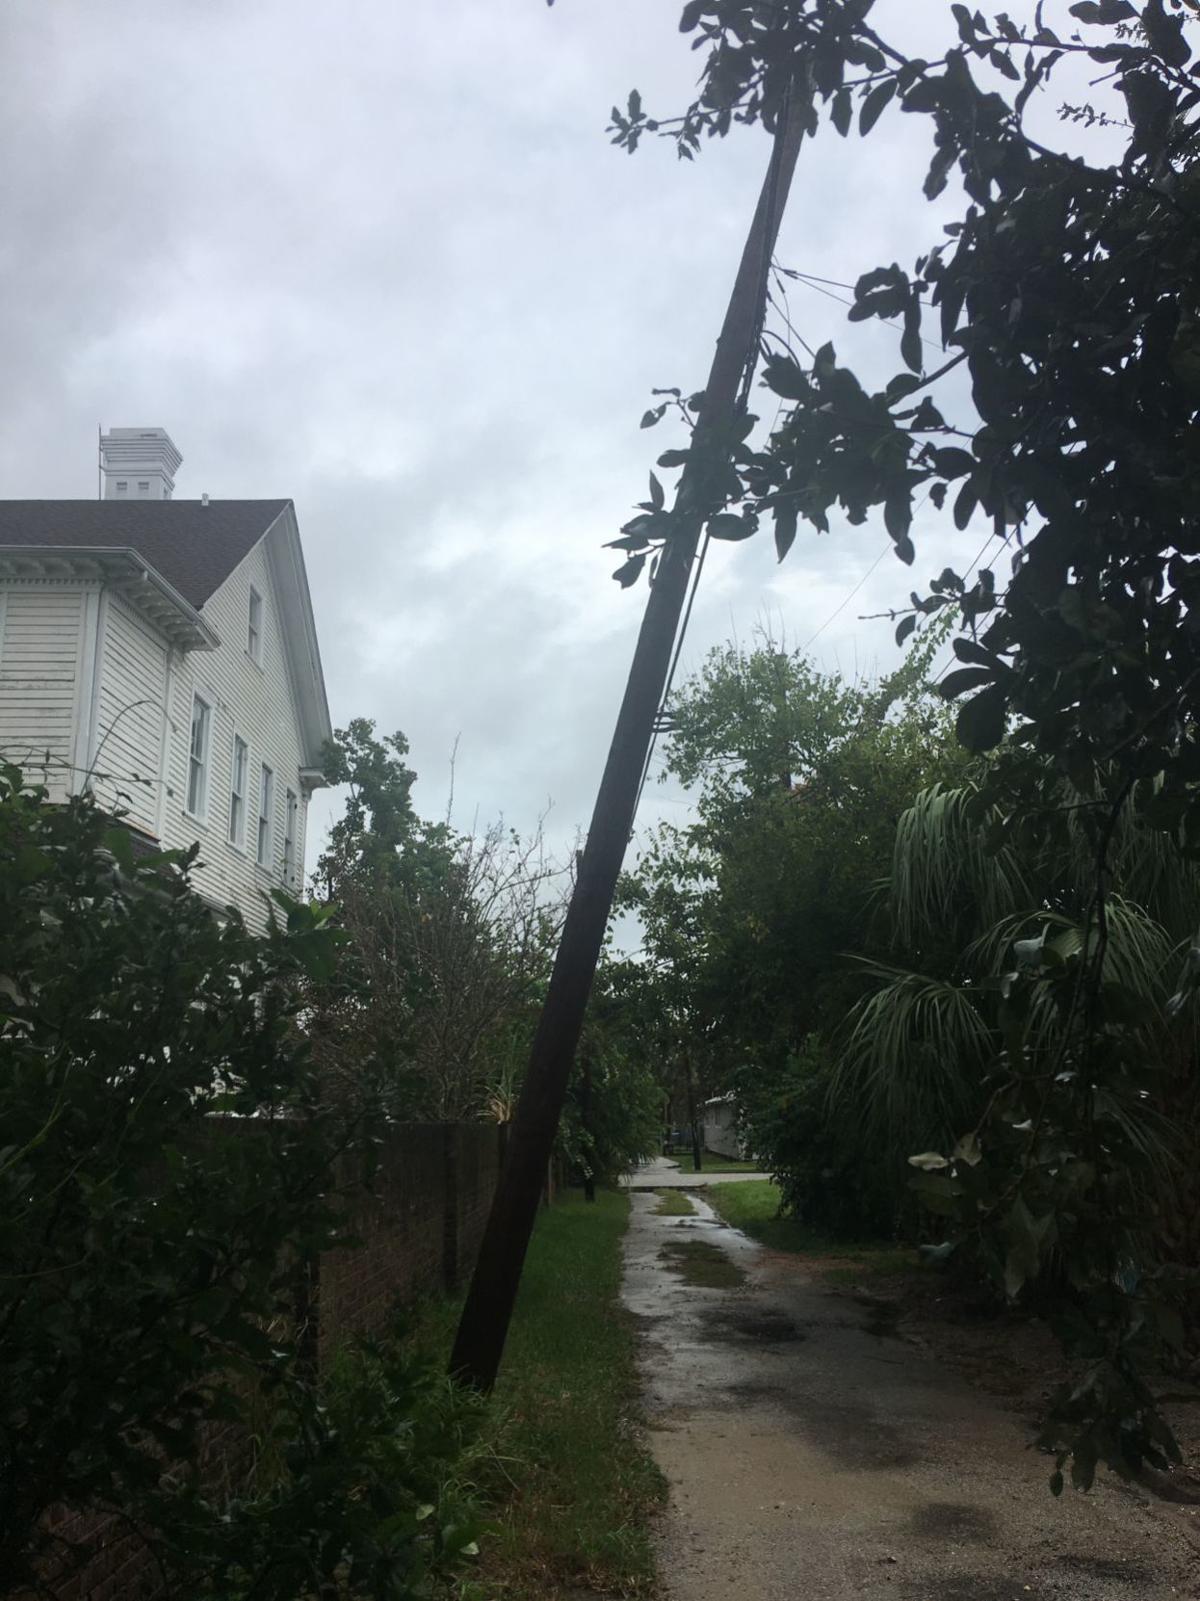 Leaning pole on Ave. O 1/2